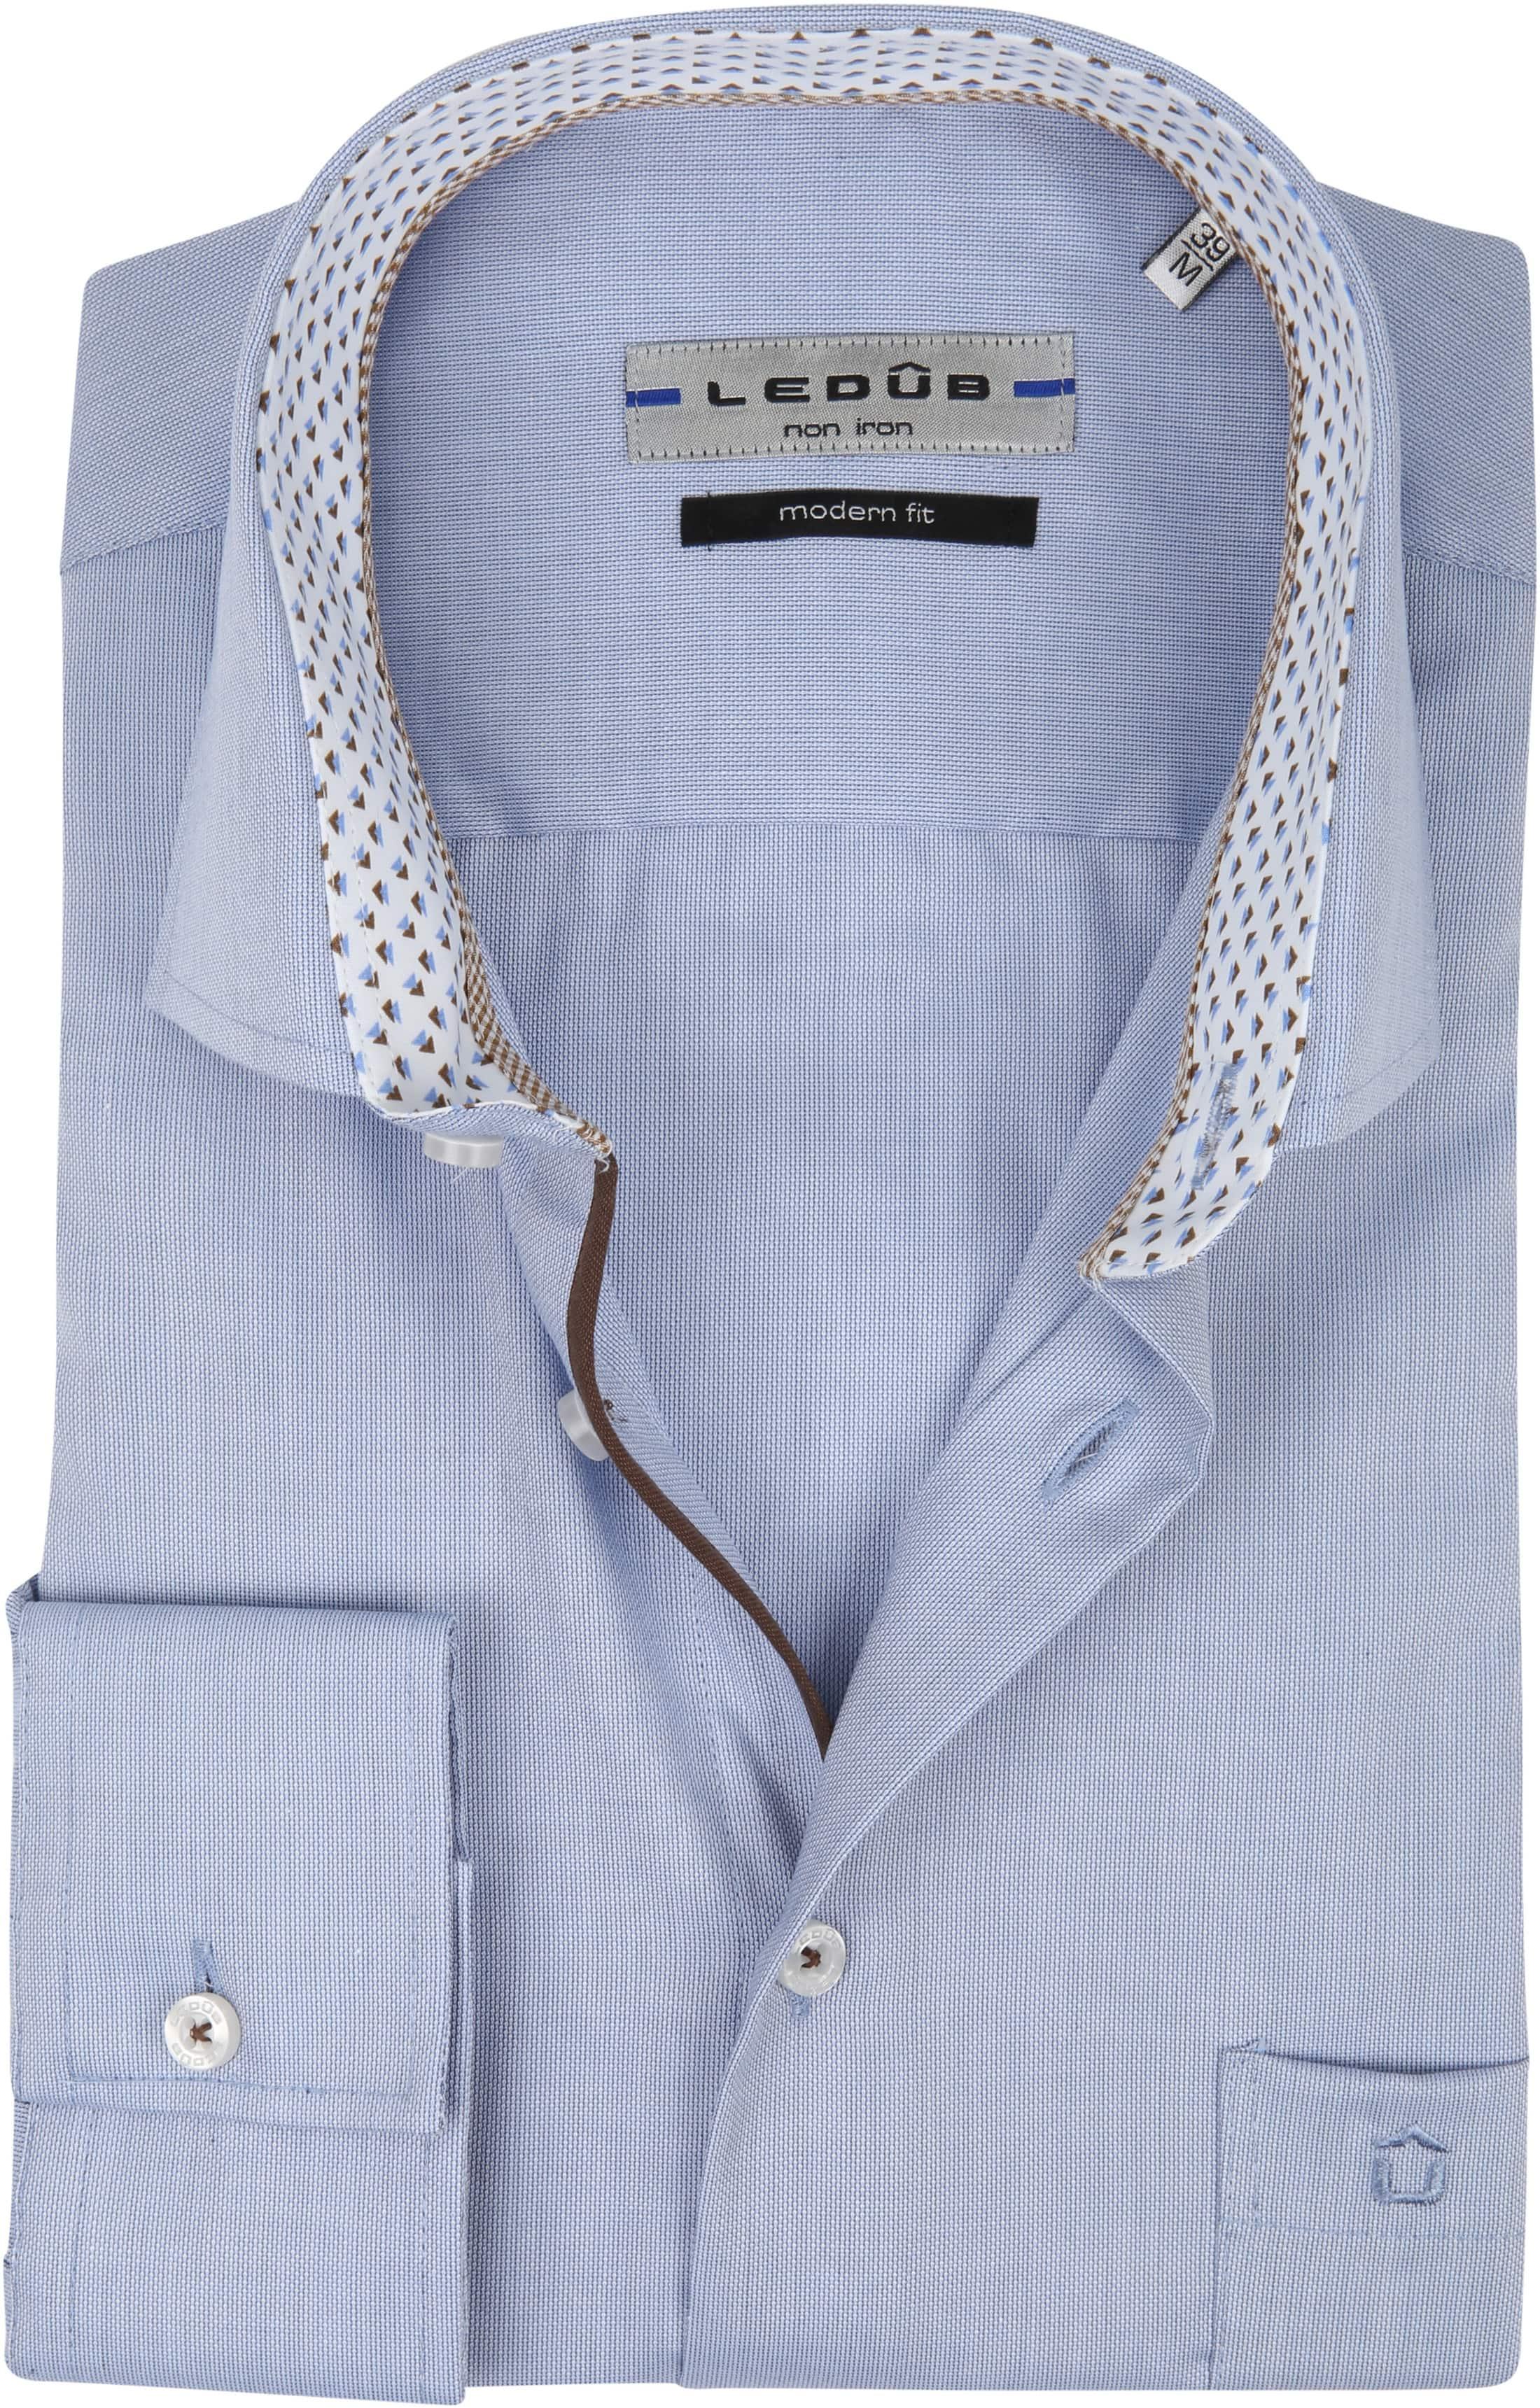 Ledub Overhemd MF Non Iron Blauw foto 0